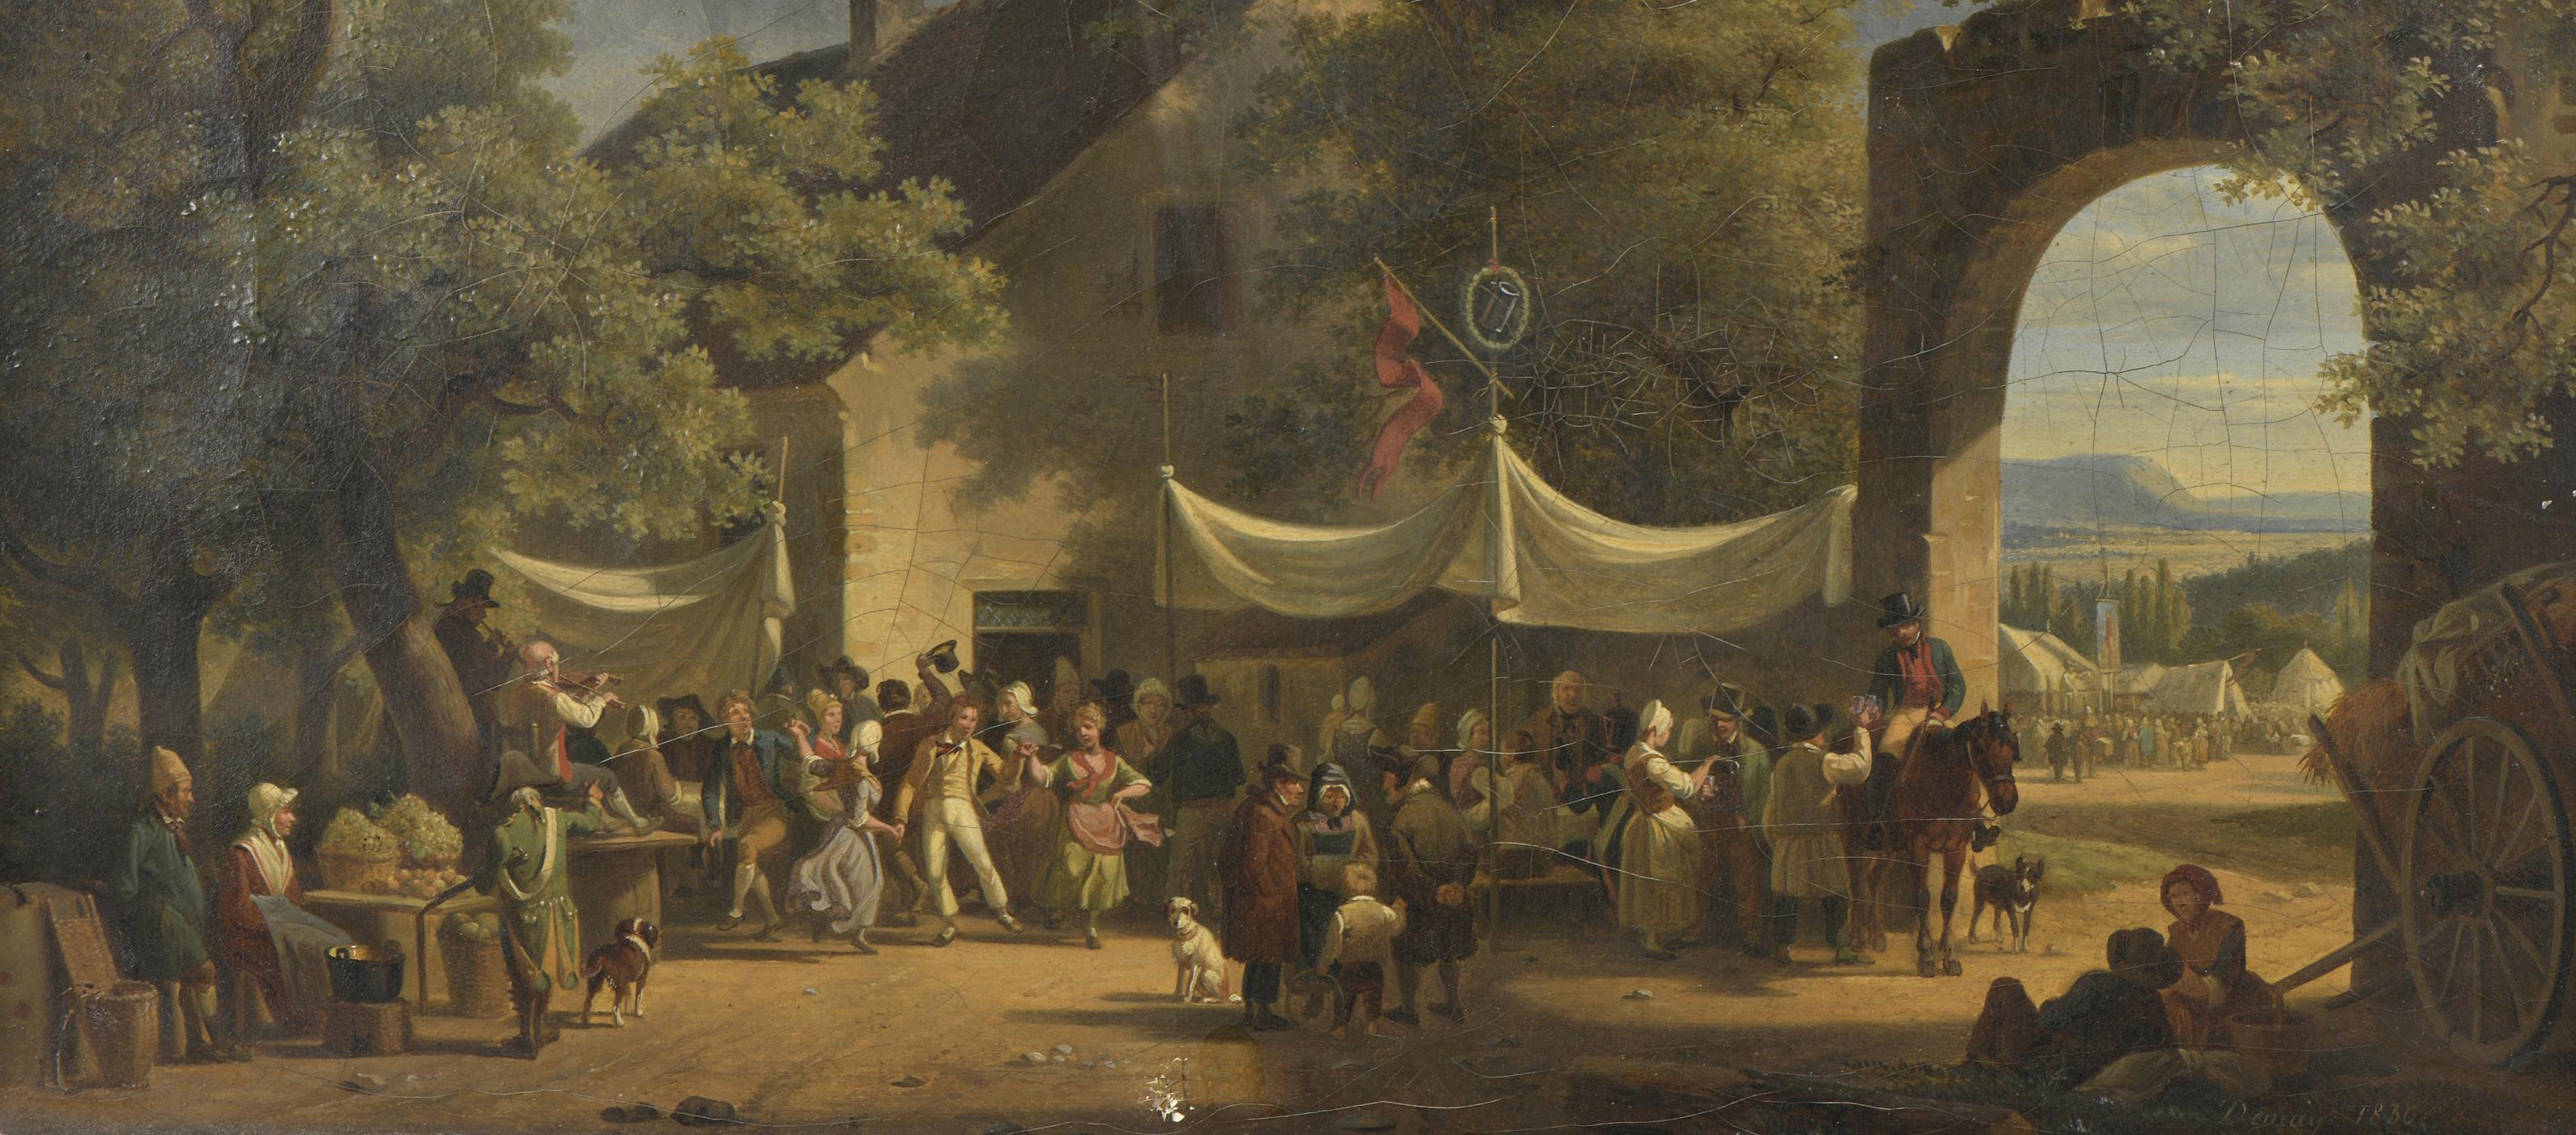 Jean-François DEMAY (1798-1850) La Fête villageoise